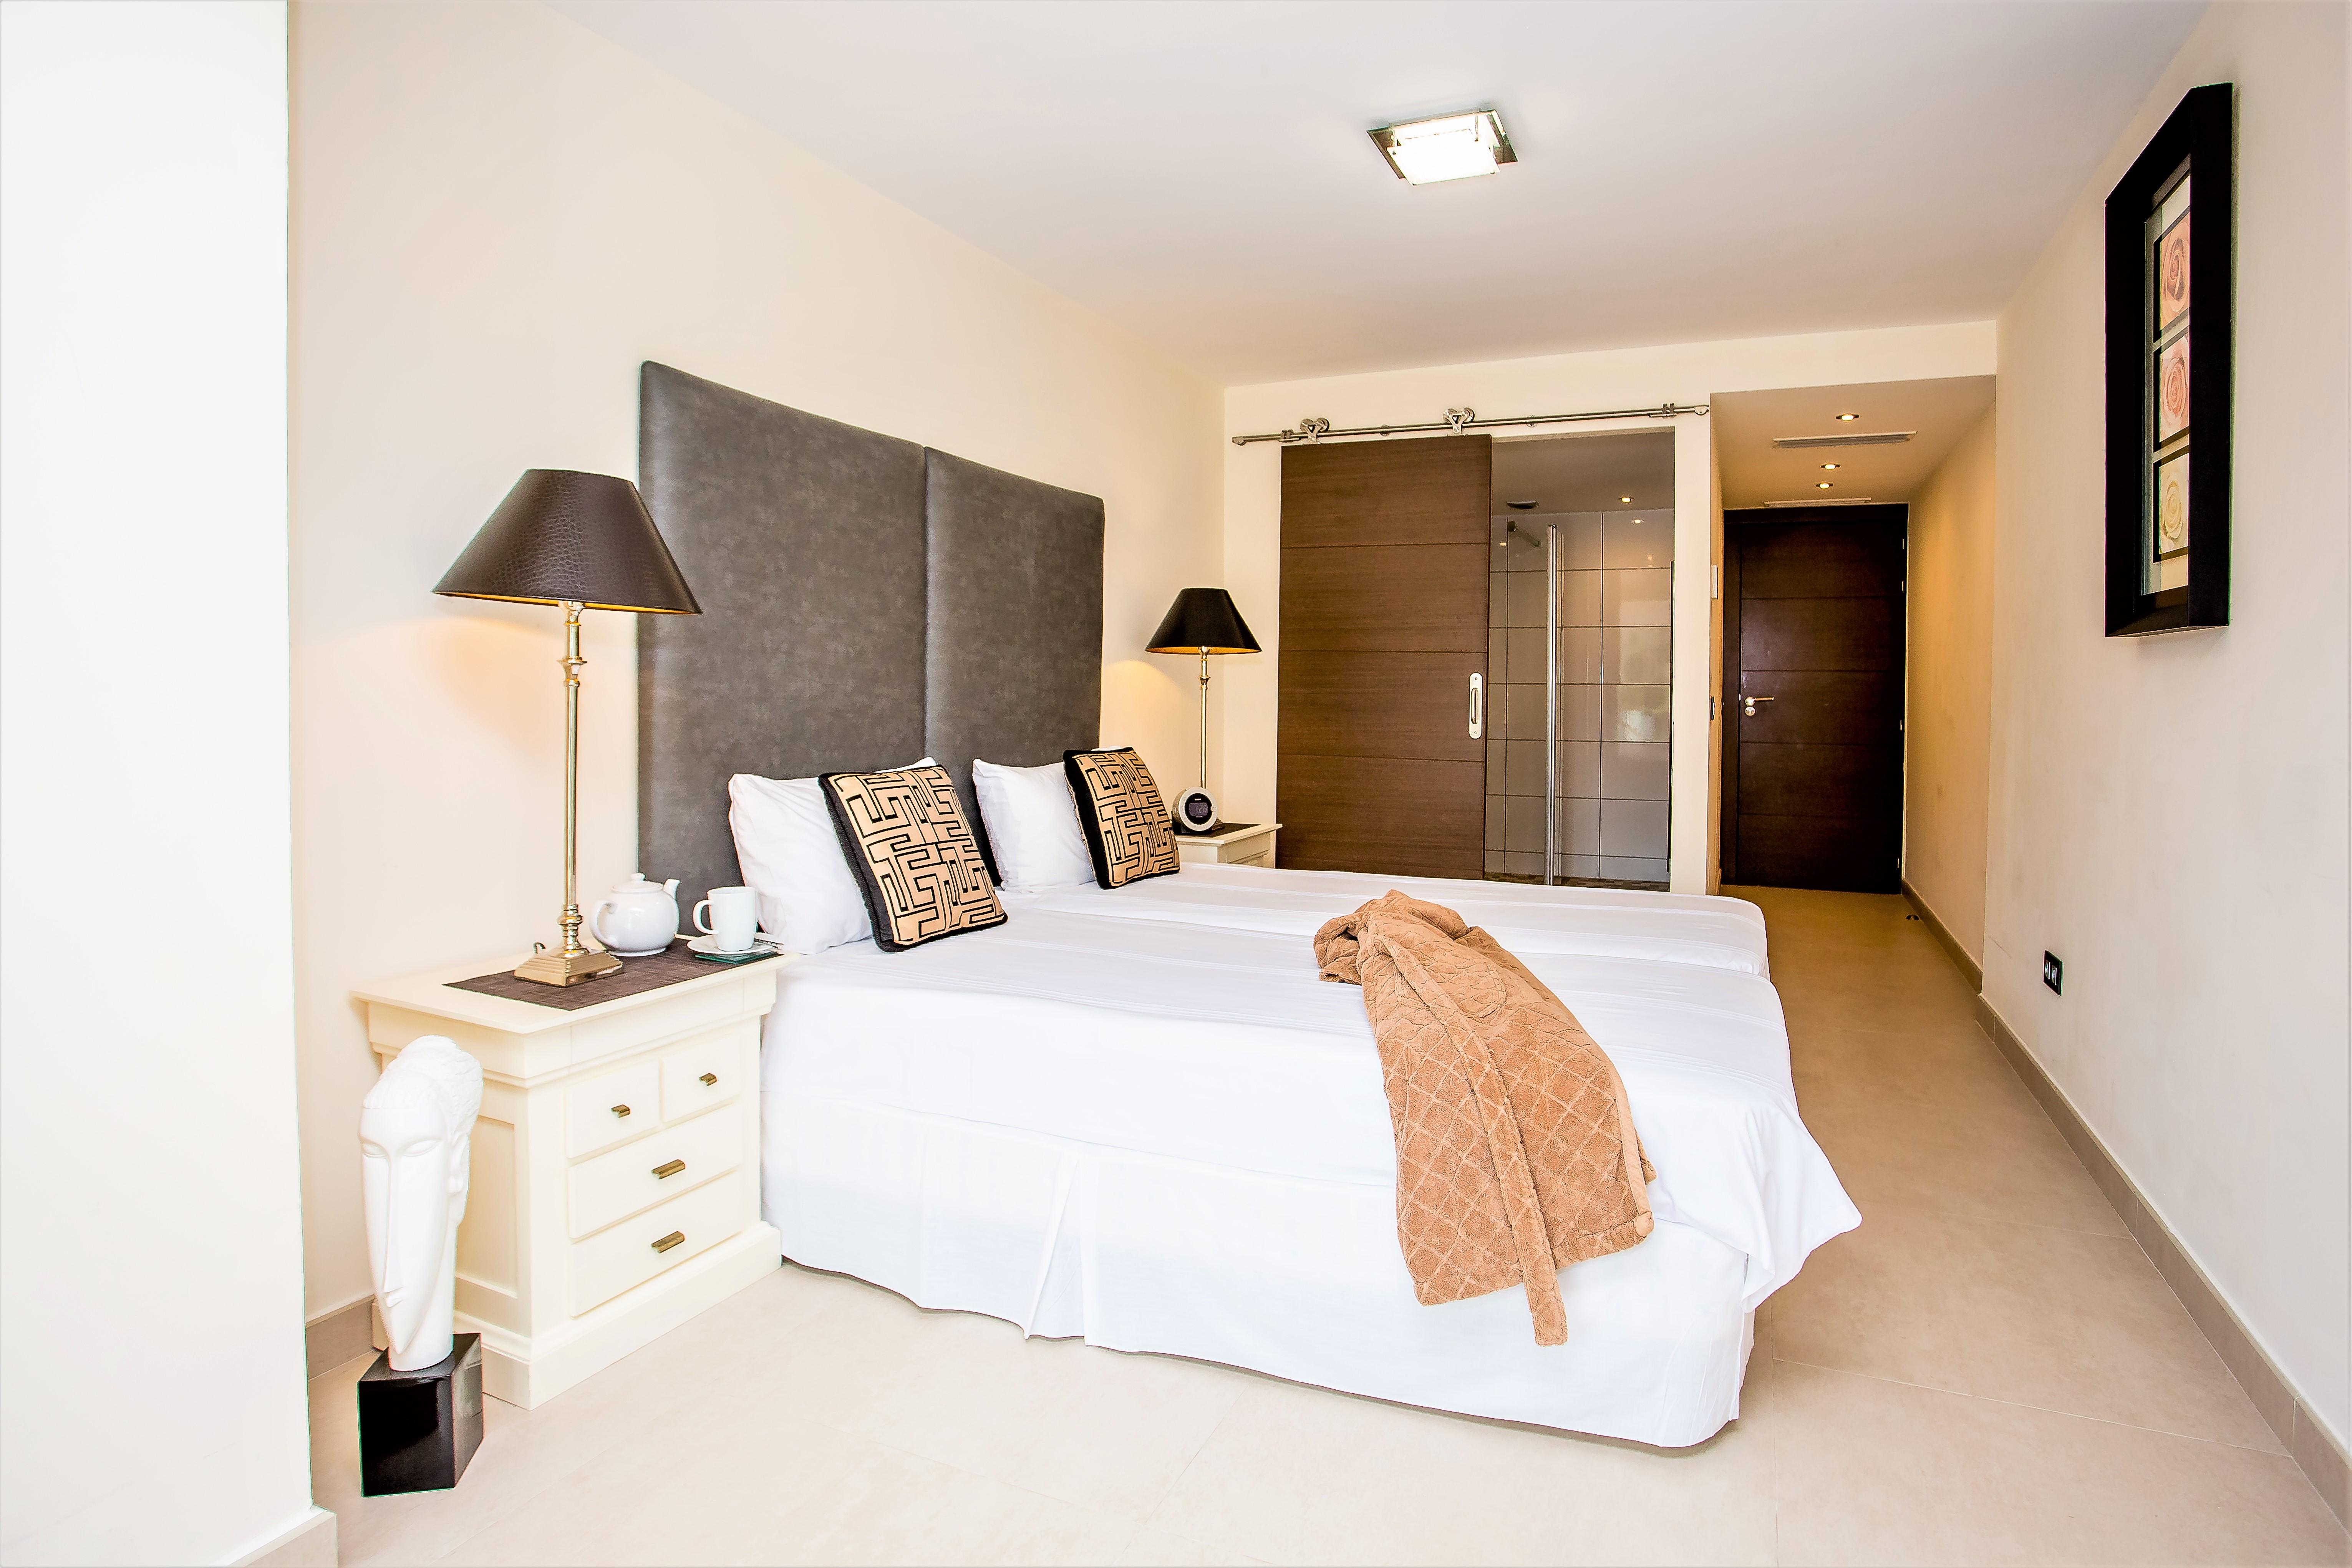 Apartment 4 B R  VILLA by Puerto Banus   Sea 5 m                                photo 20281210